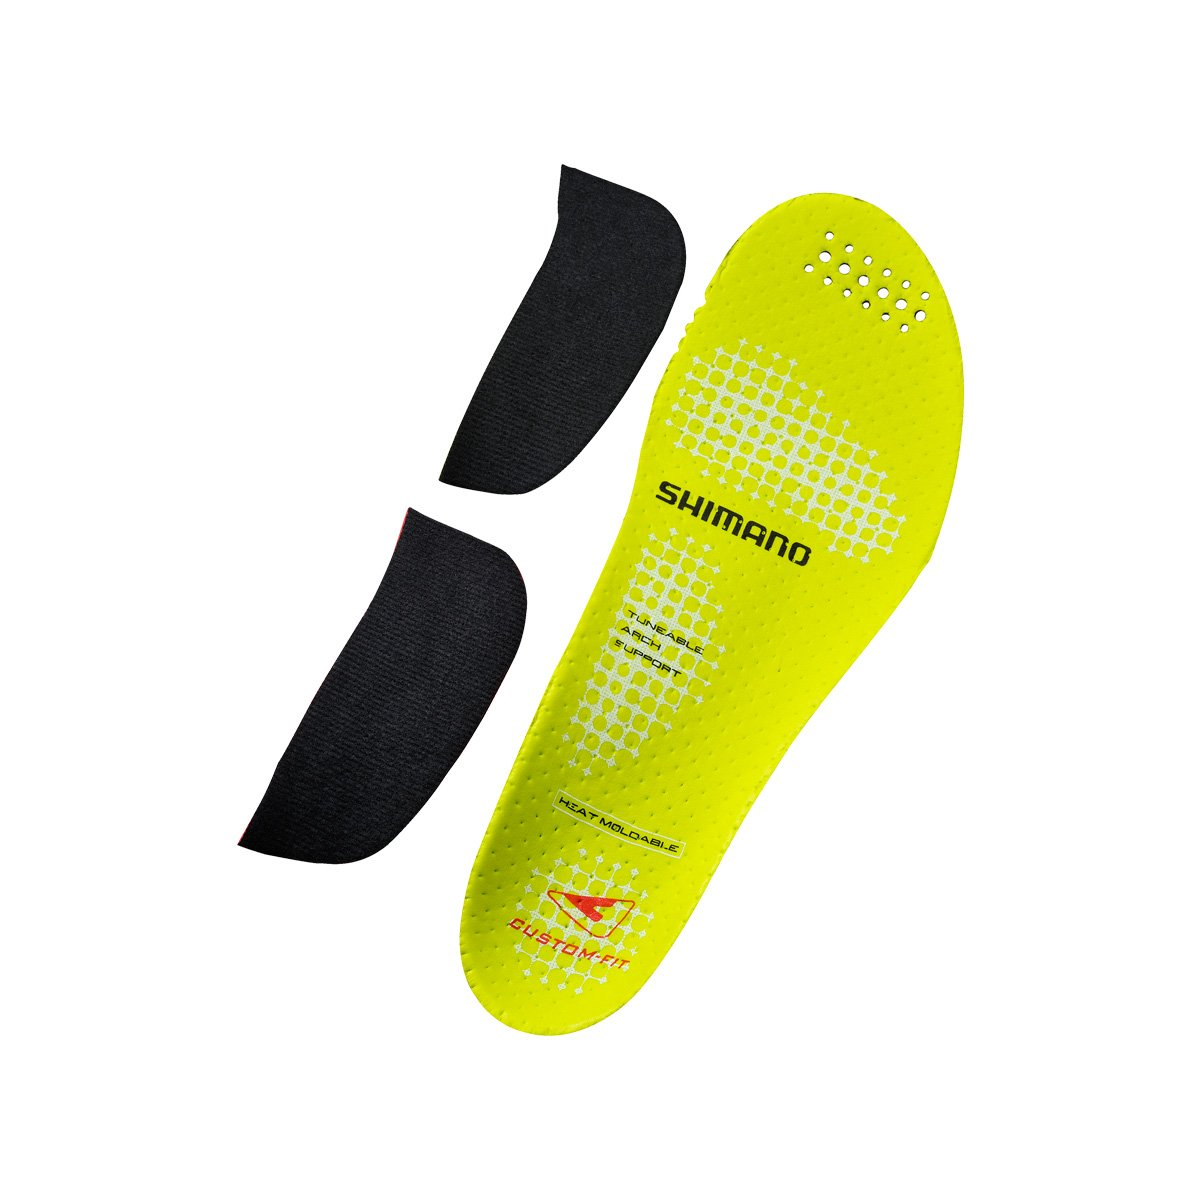 Shimano Custom Fit Cycling Shoe Insole - ESMSHRC9INCF (YELLOW - 40-41.5)